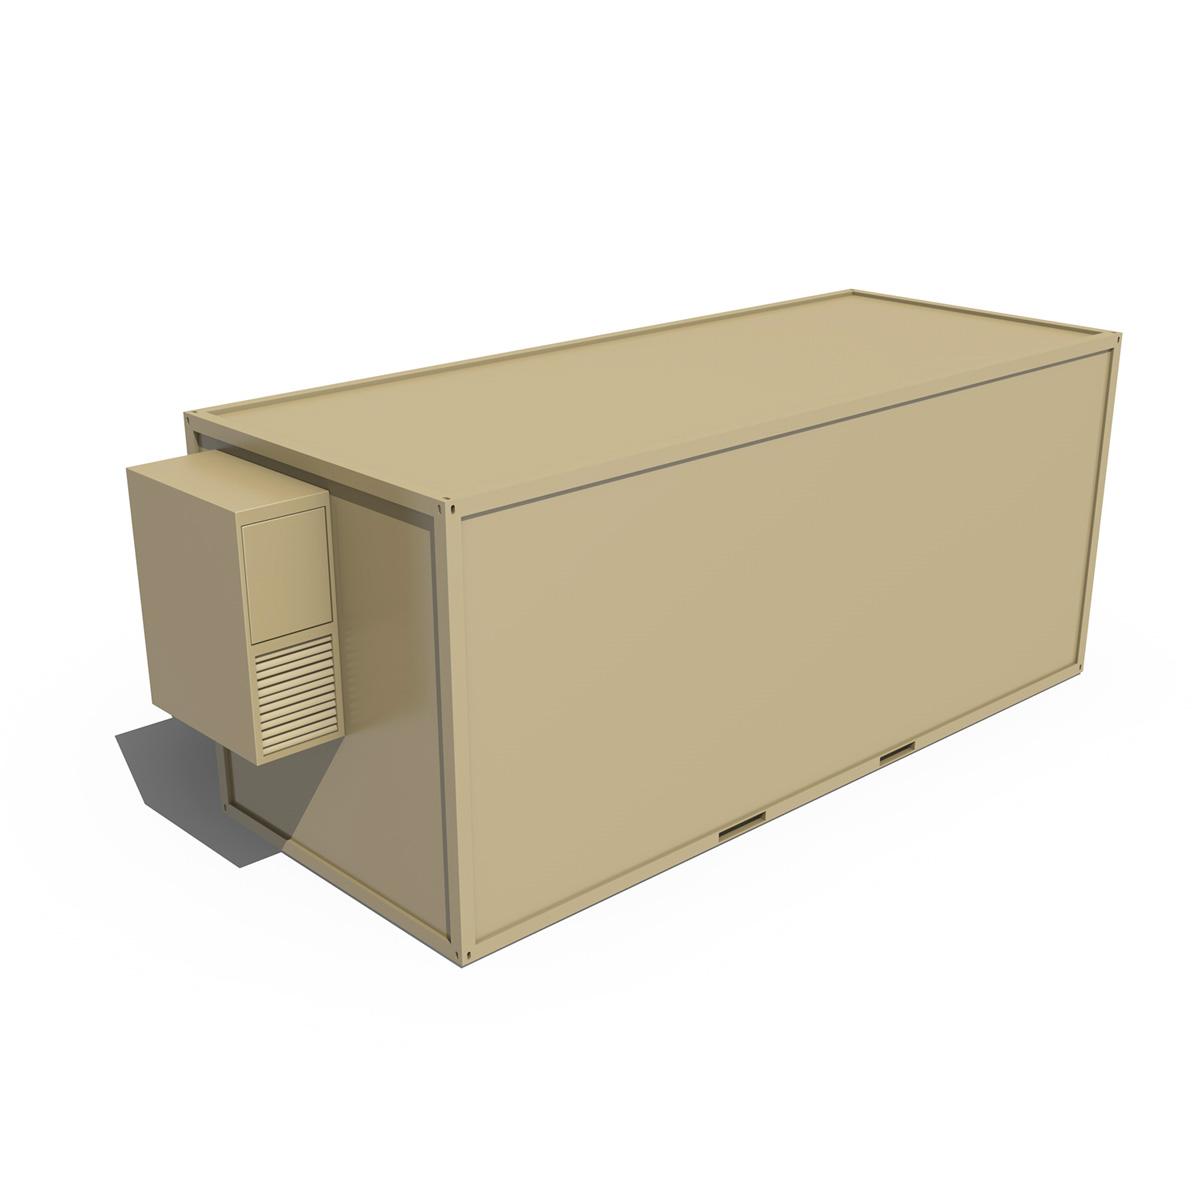 20ft ofis konteyner versiyası iki 3d model 3ds fbx c4d lwo obj 252276